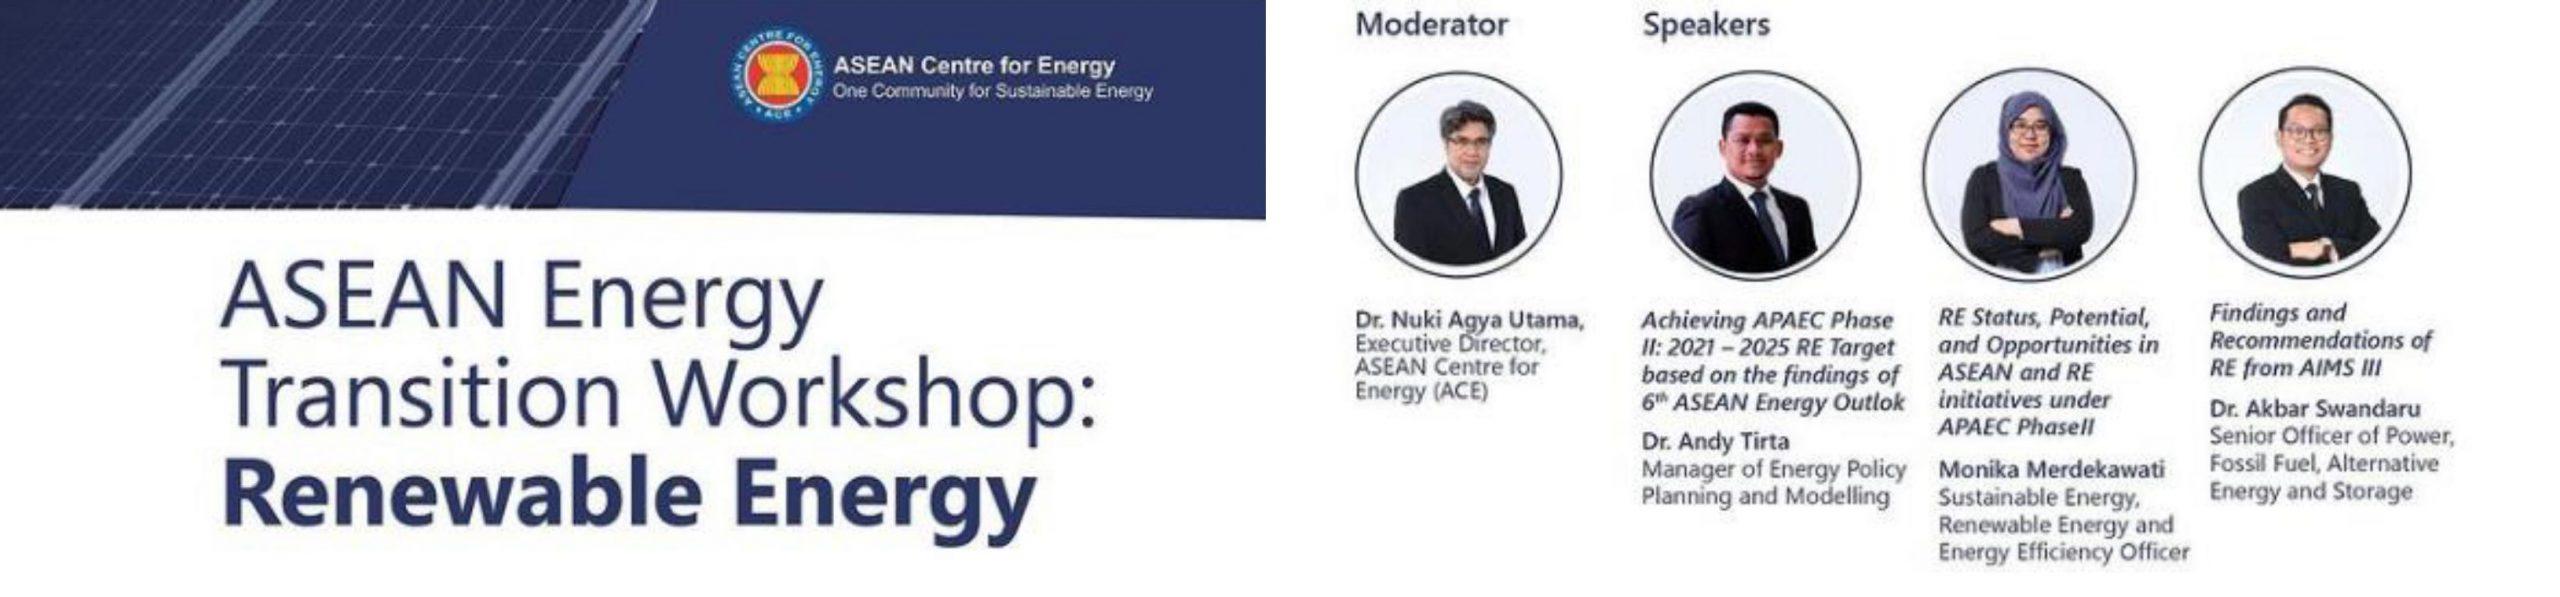 ASEAN Energy Transition Workshop: Renewable Energy